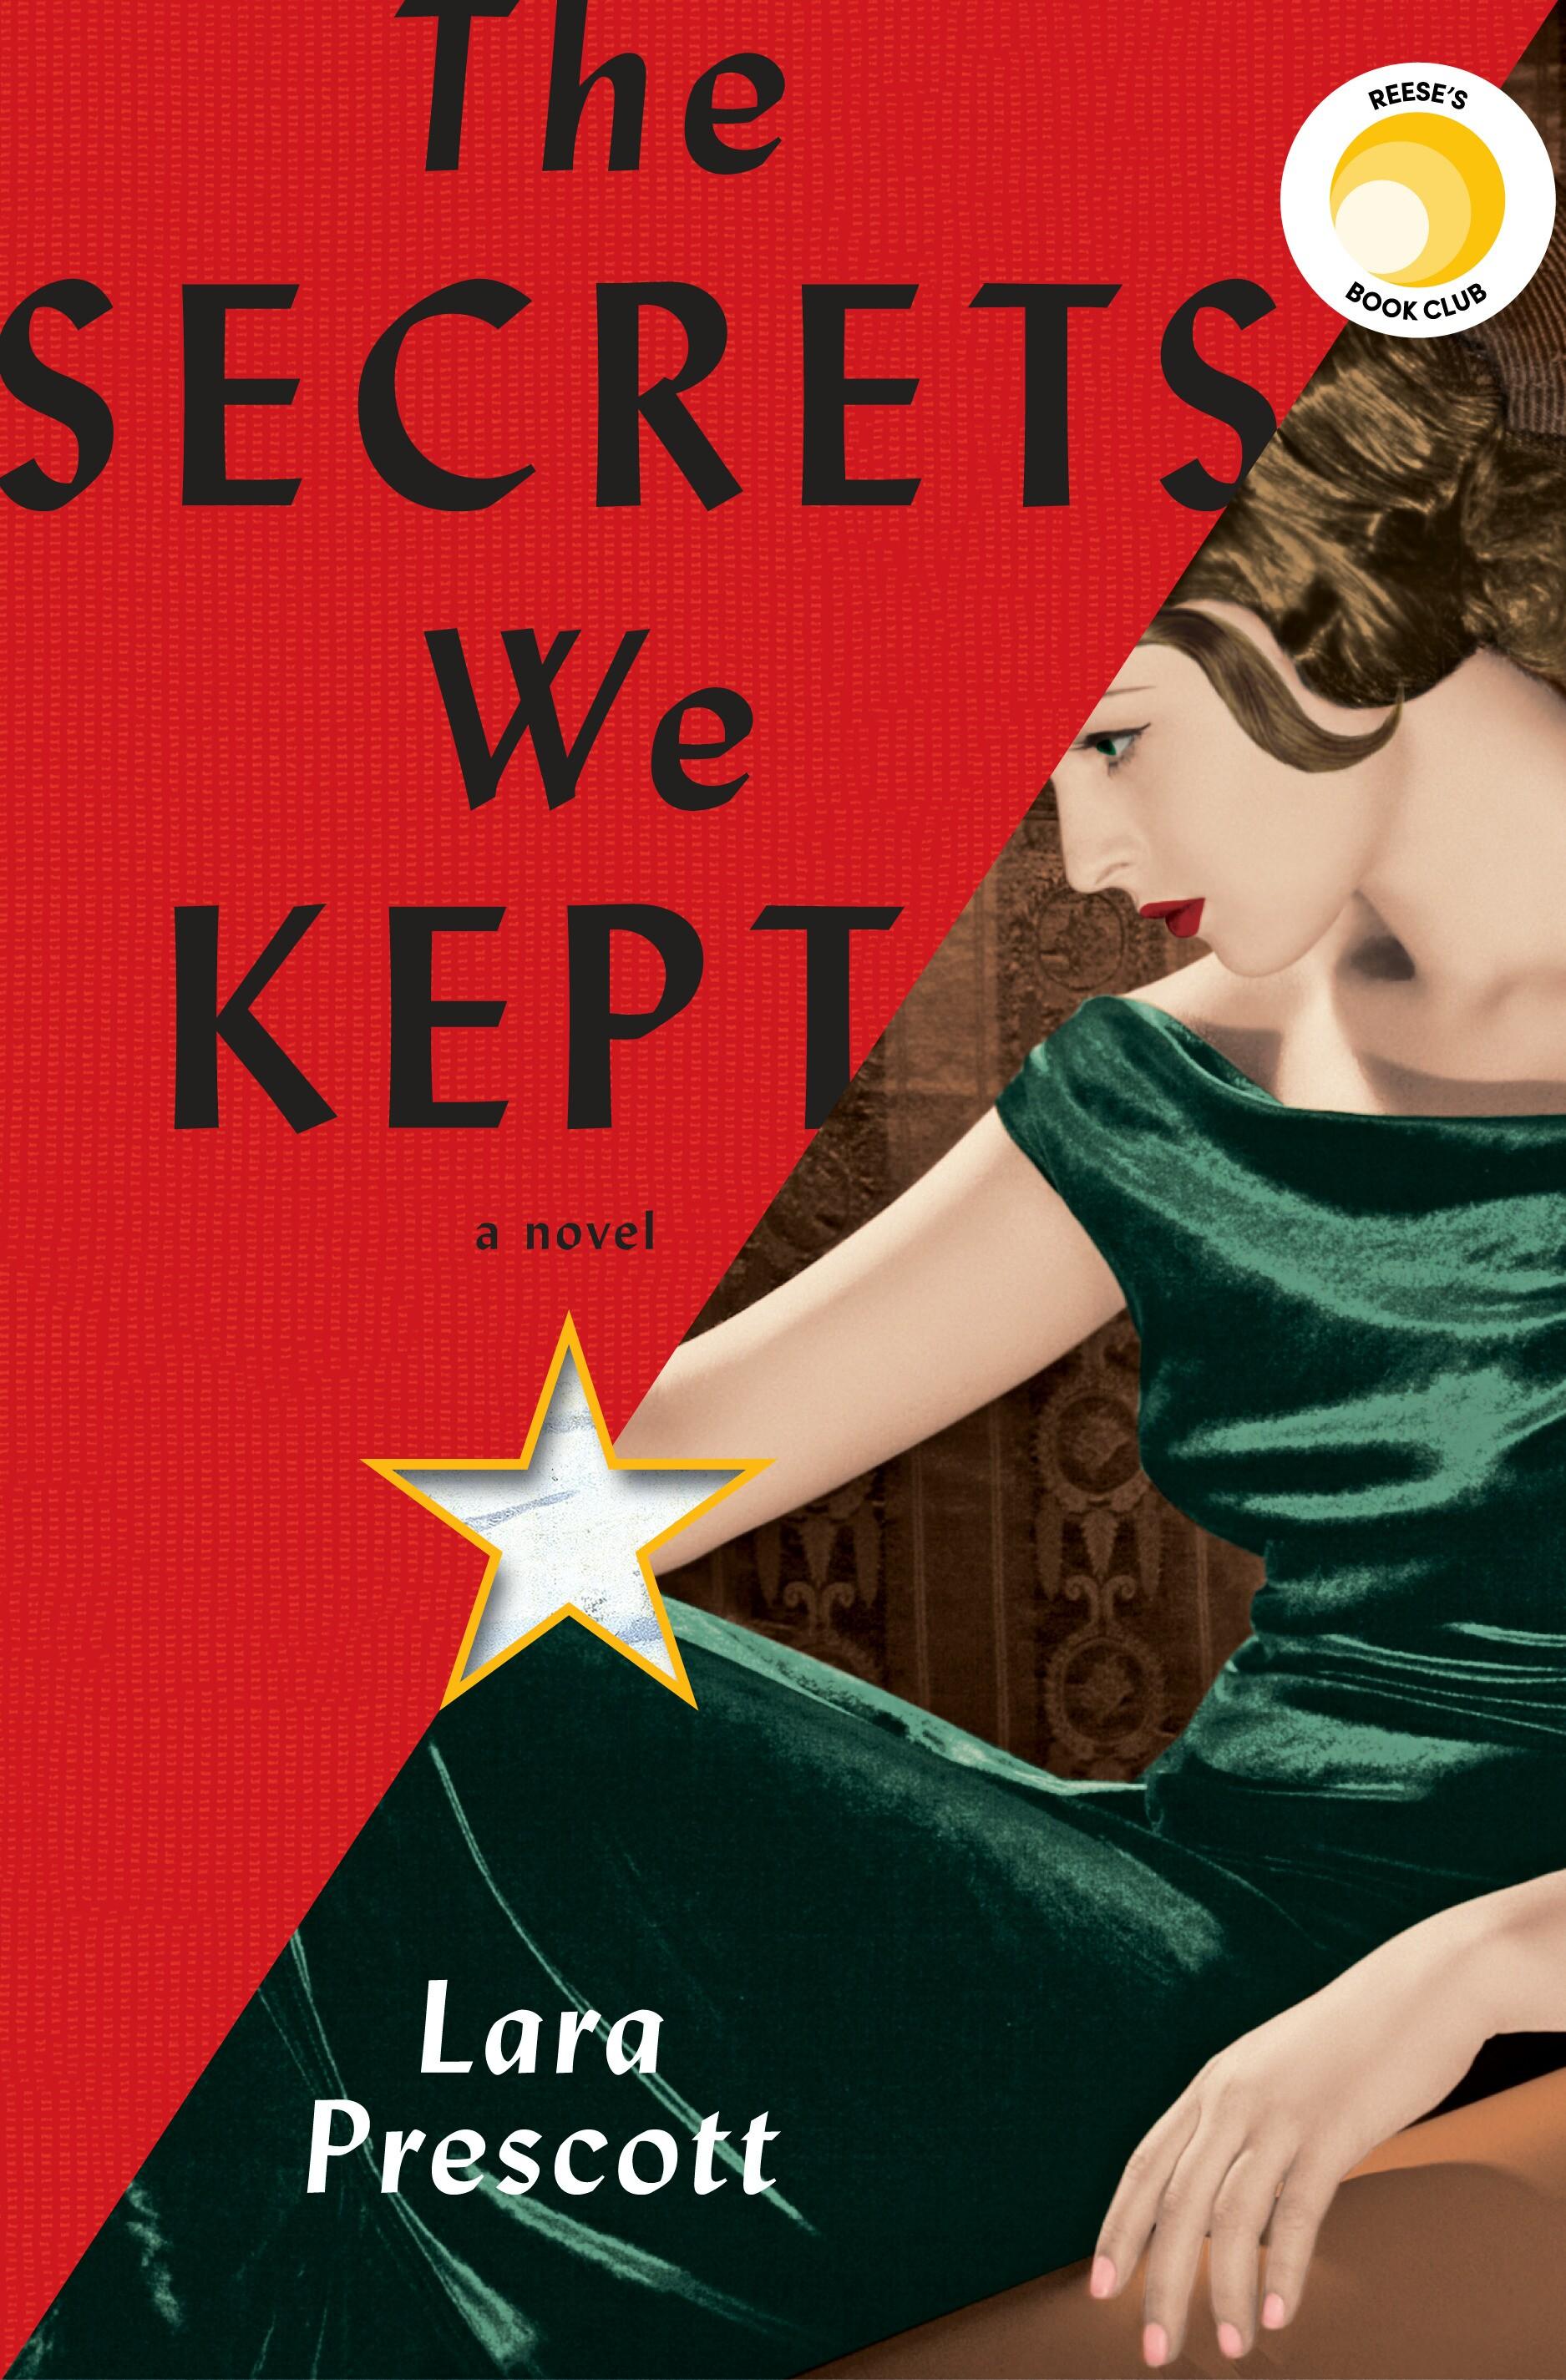 The Secrets We Kept book cover